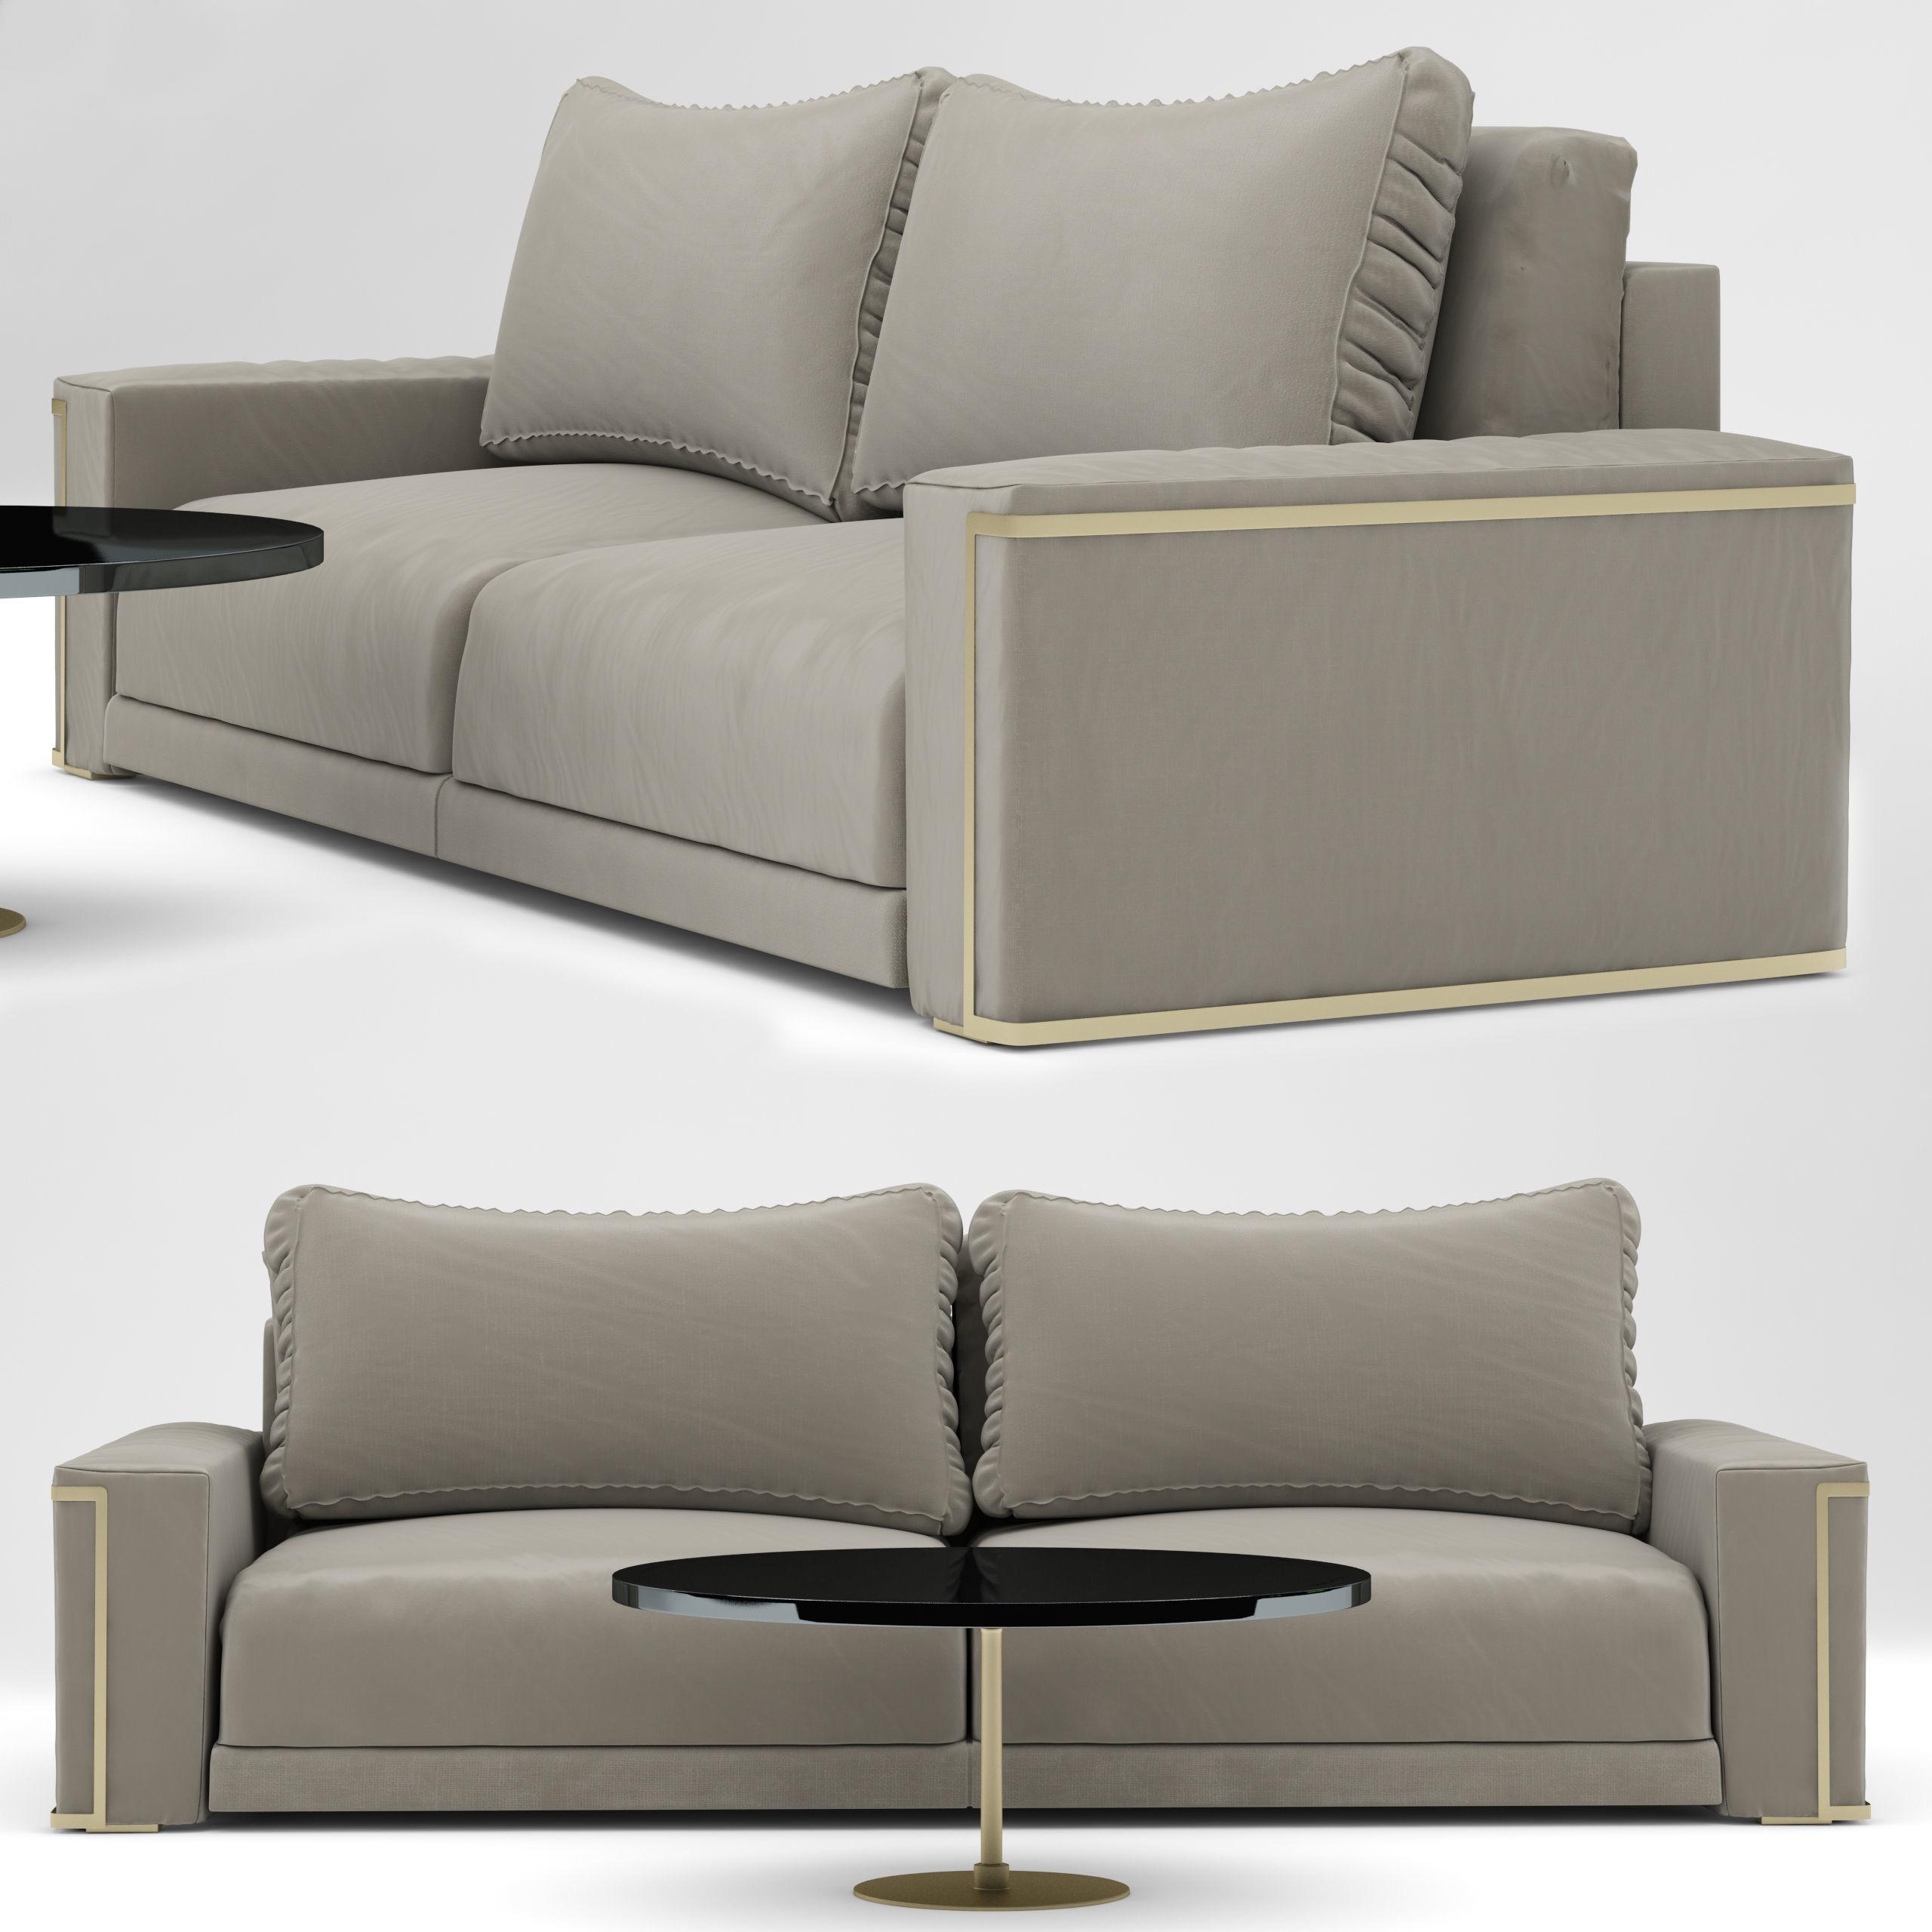 Stupendous Sofa Montgomery Sofa Design Fendi Casa 3D Model Alphanode Cool Chair Designs And Ideas Alphanodeonline